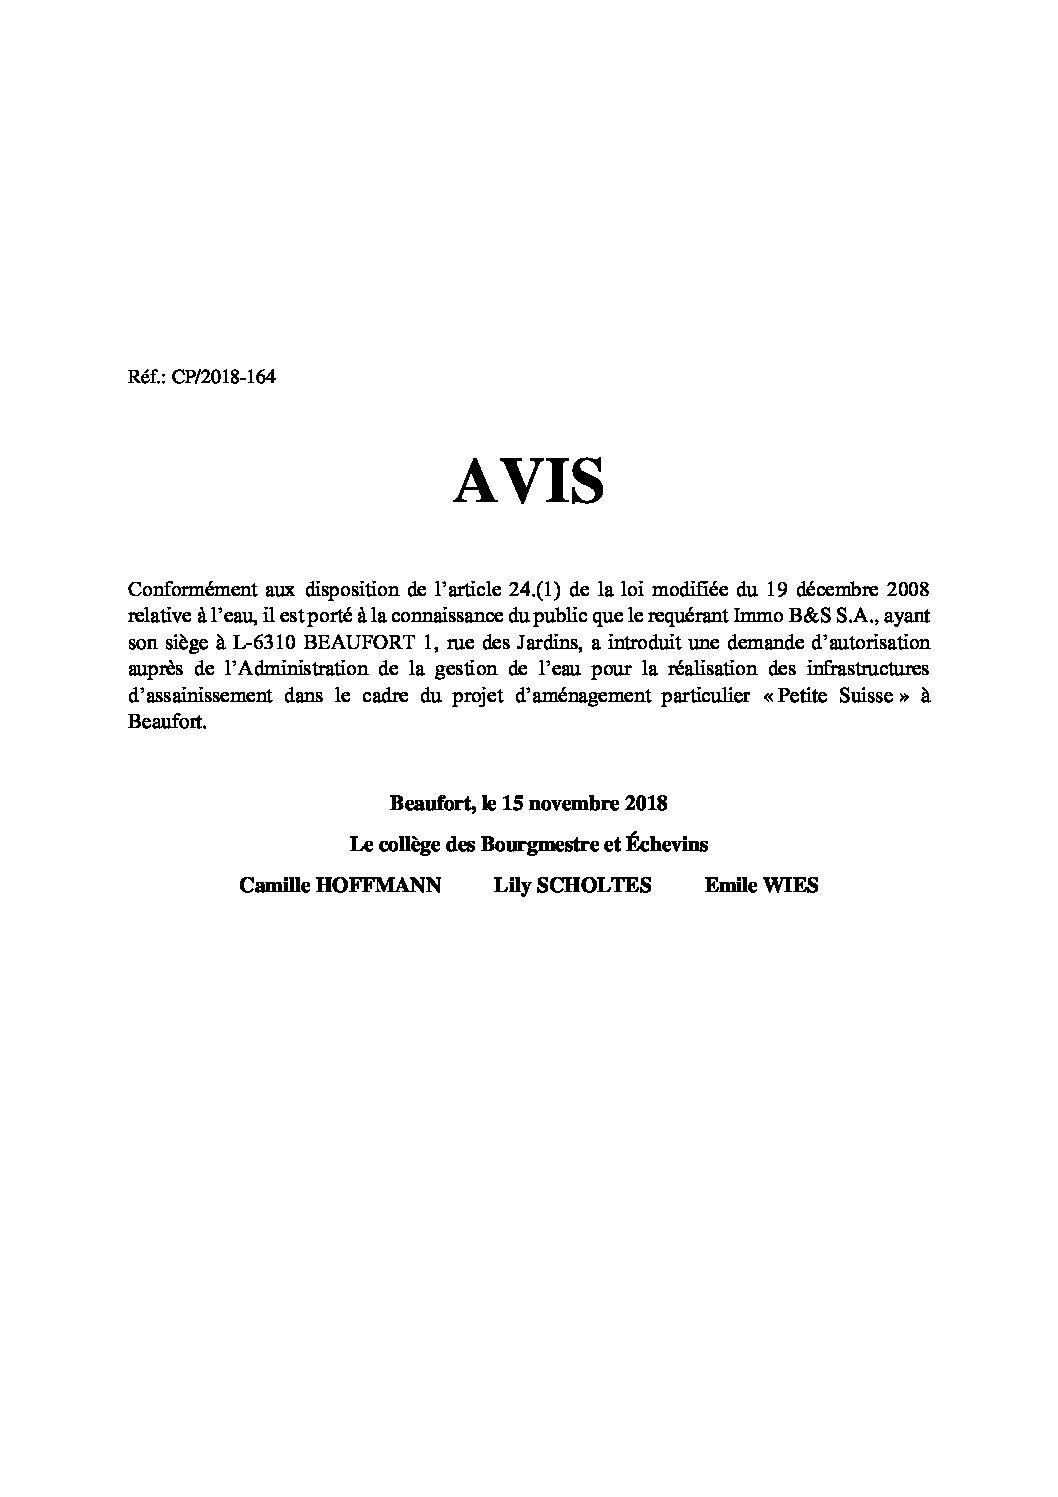 20181115_AvisEau